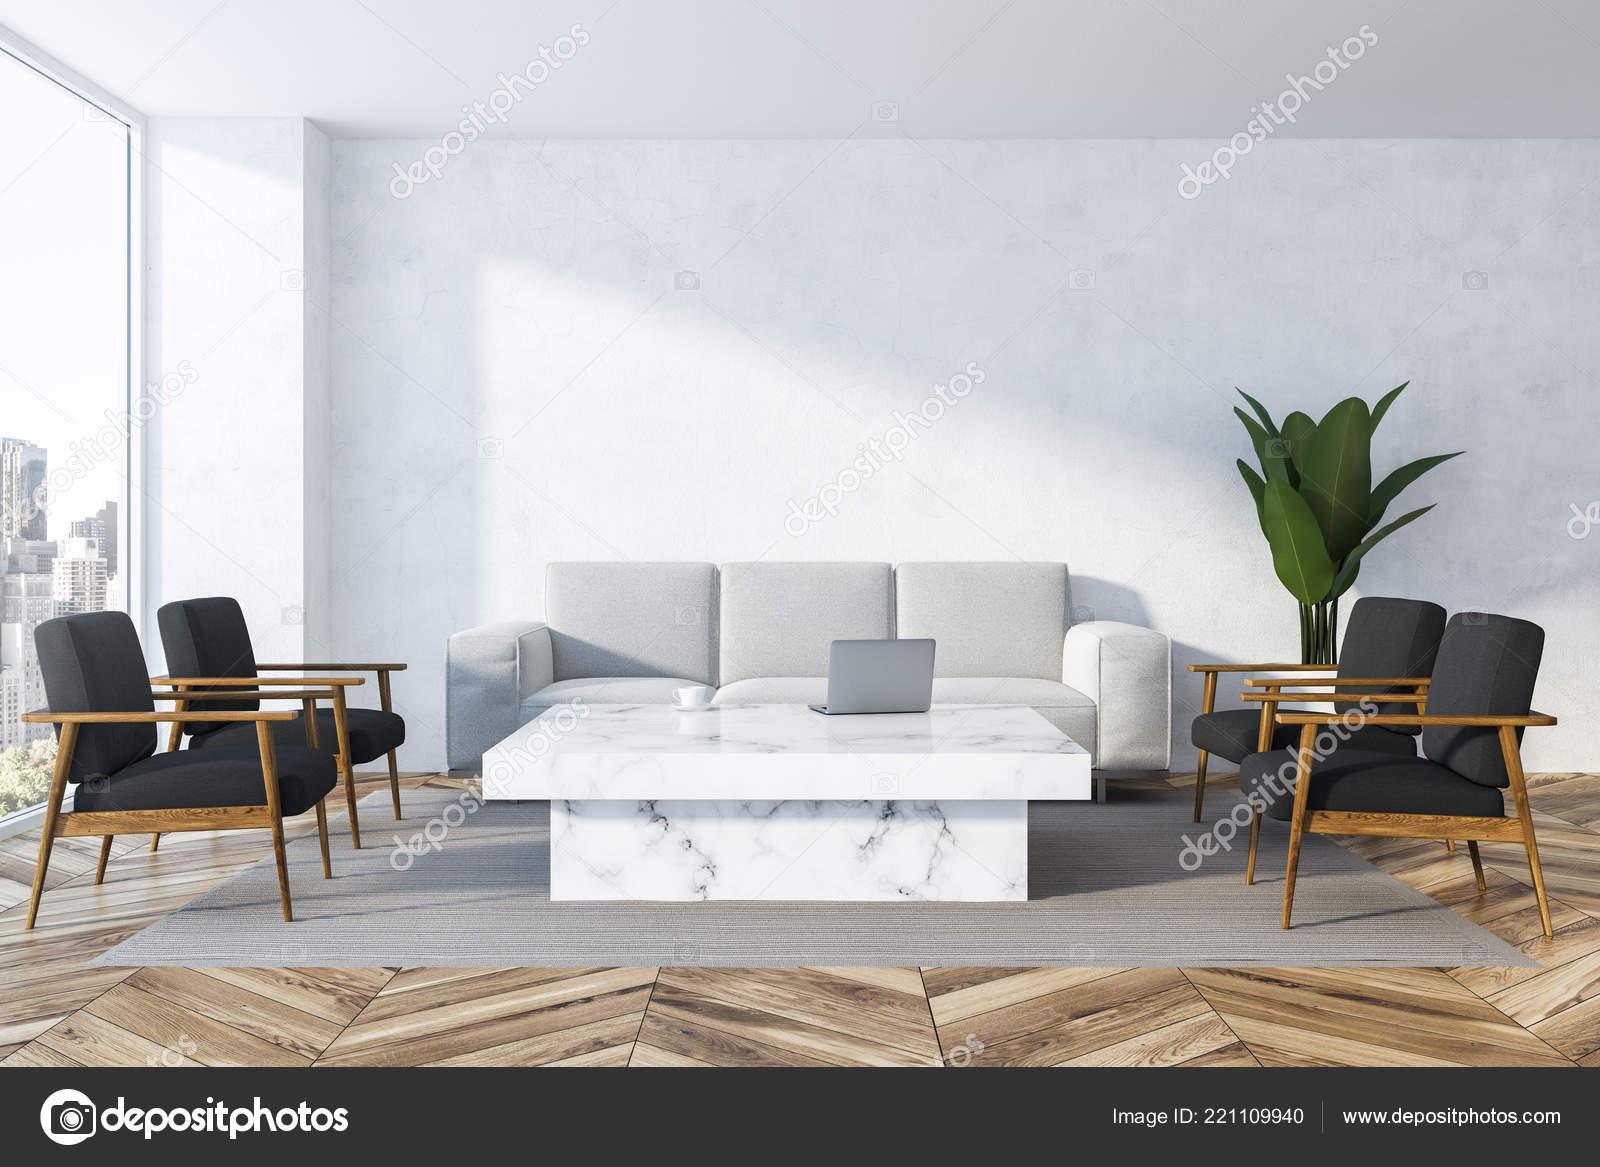 Outstanding Interior White Living Room White Walls Wooden Floor Gamerscity Chair Design For Home Gamerscityorg